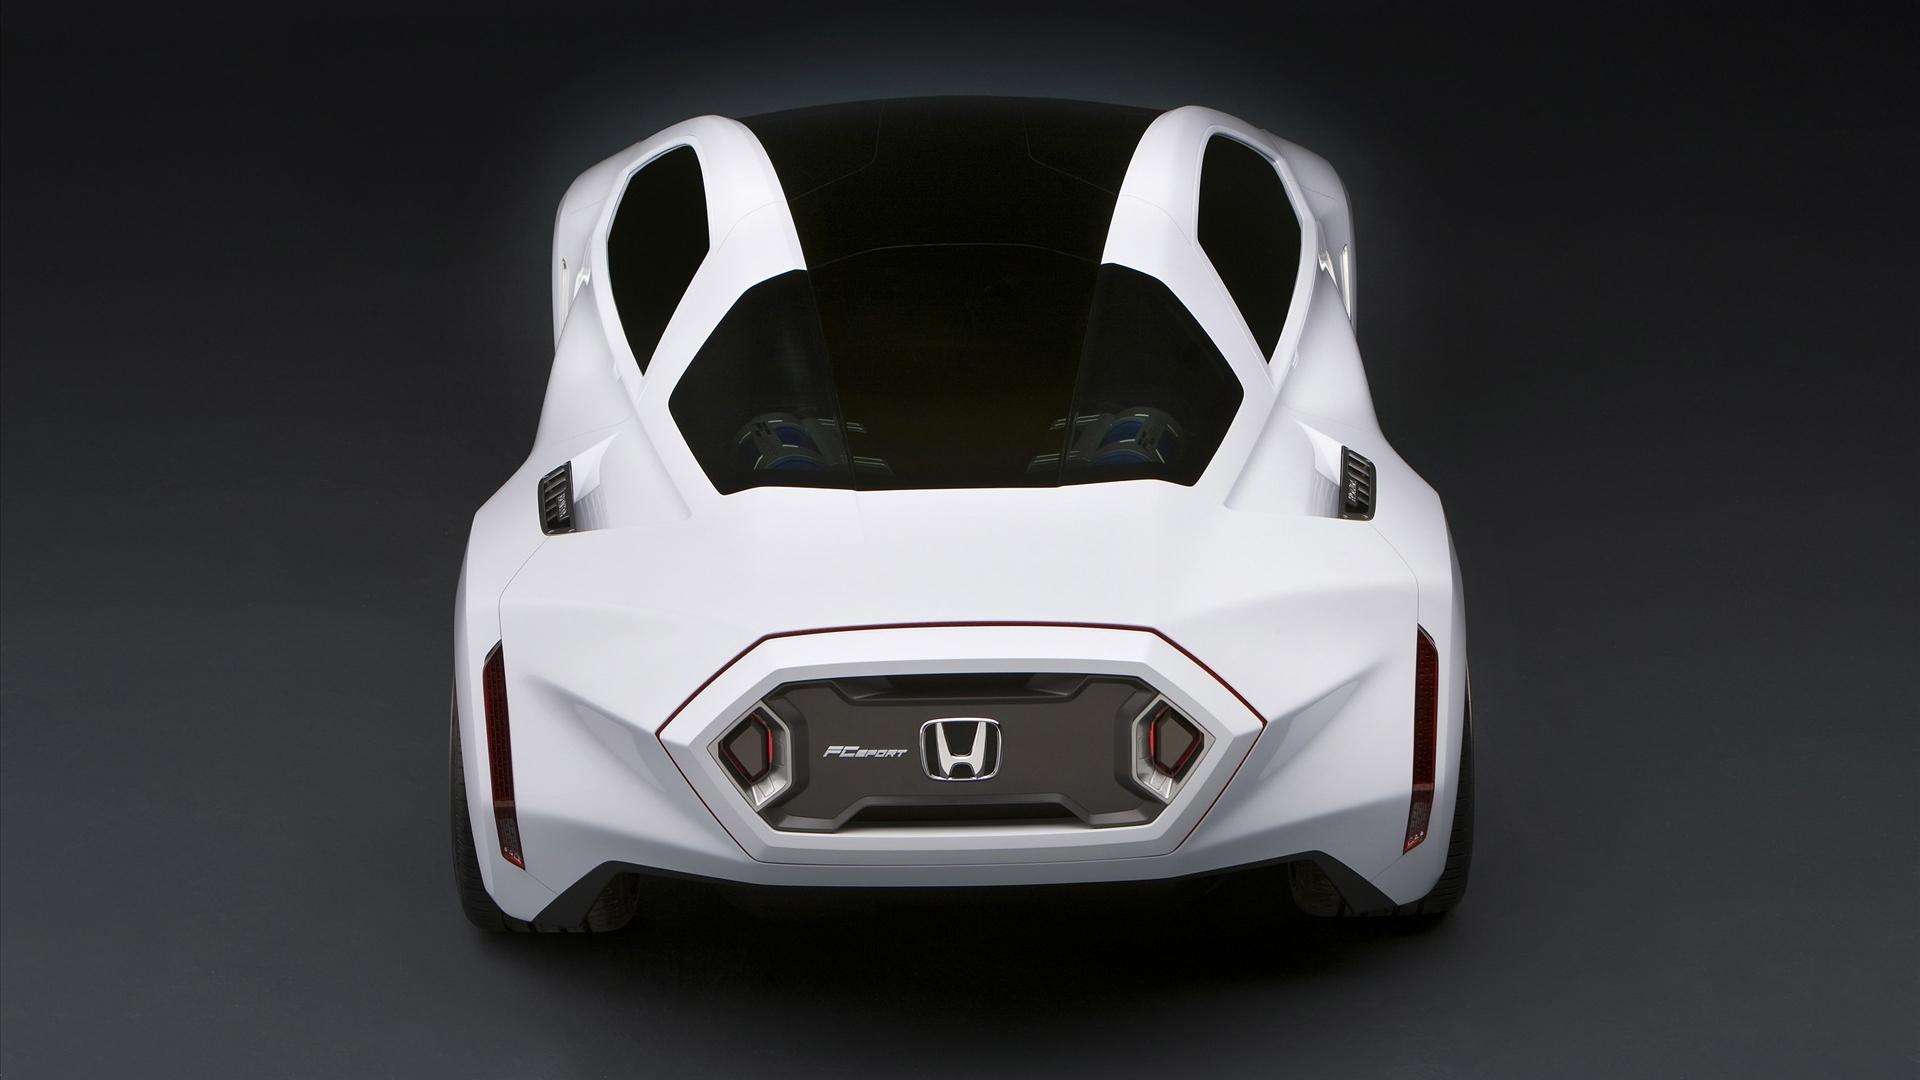 Hyundai Sports Car wallpaper